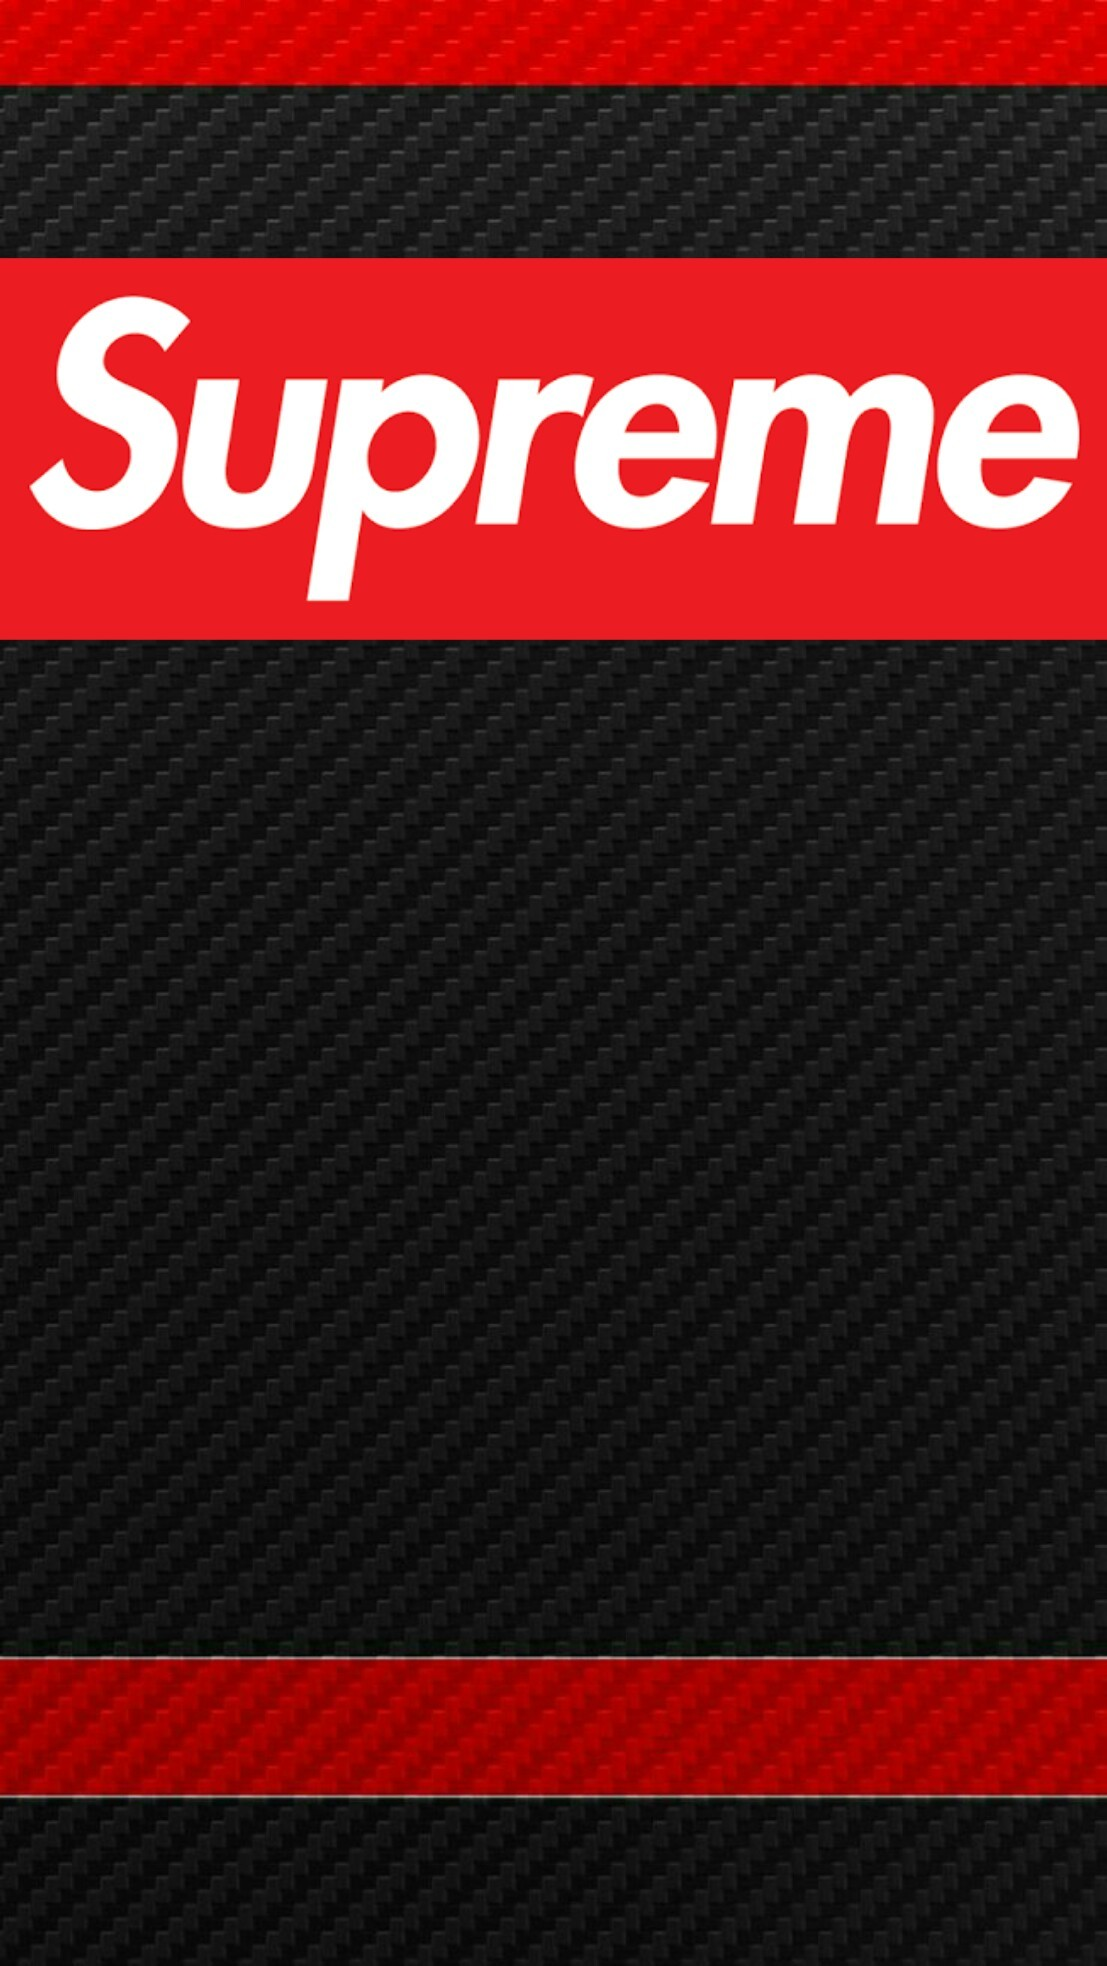 #samsung #edge #s6 #supreme #black #wallpaper #android #iphone